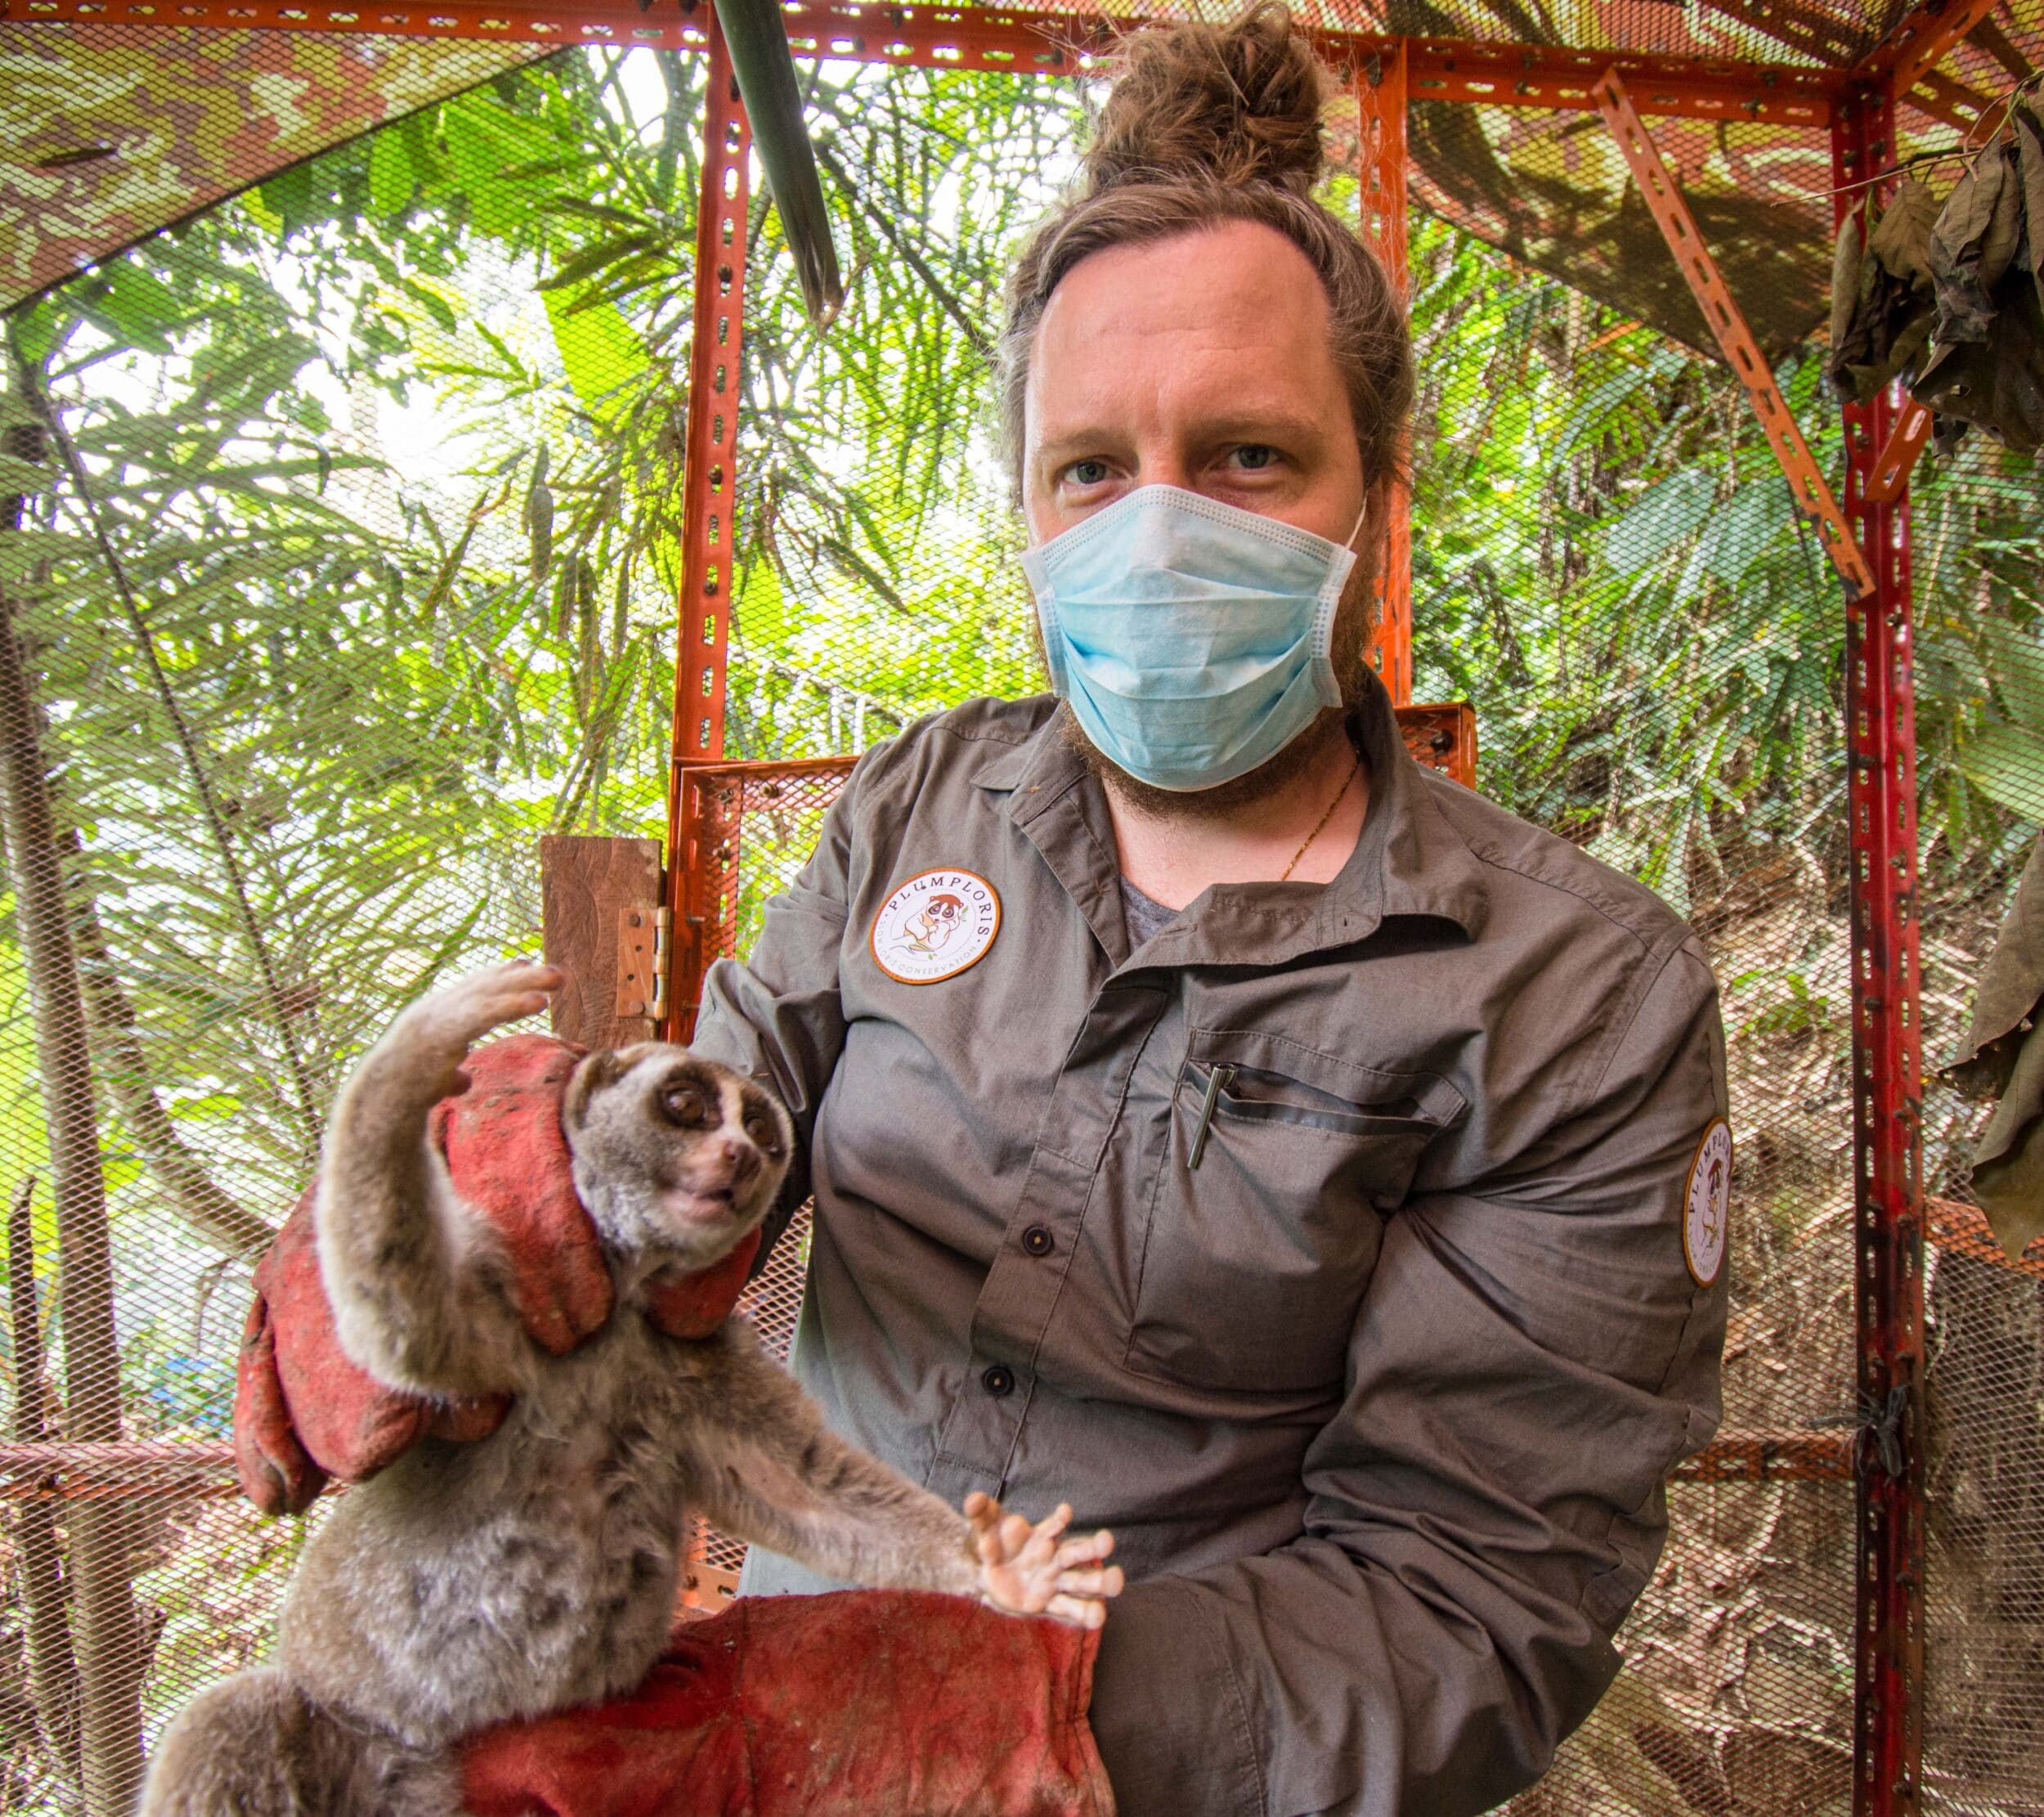 Artenschutz: Neues Plumplori-Schutzprojekt im Zoo Dortmund